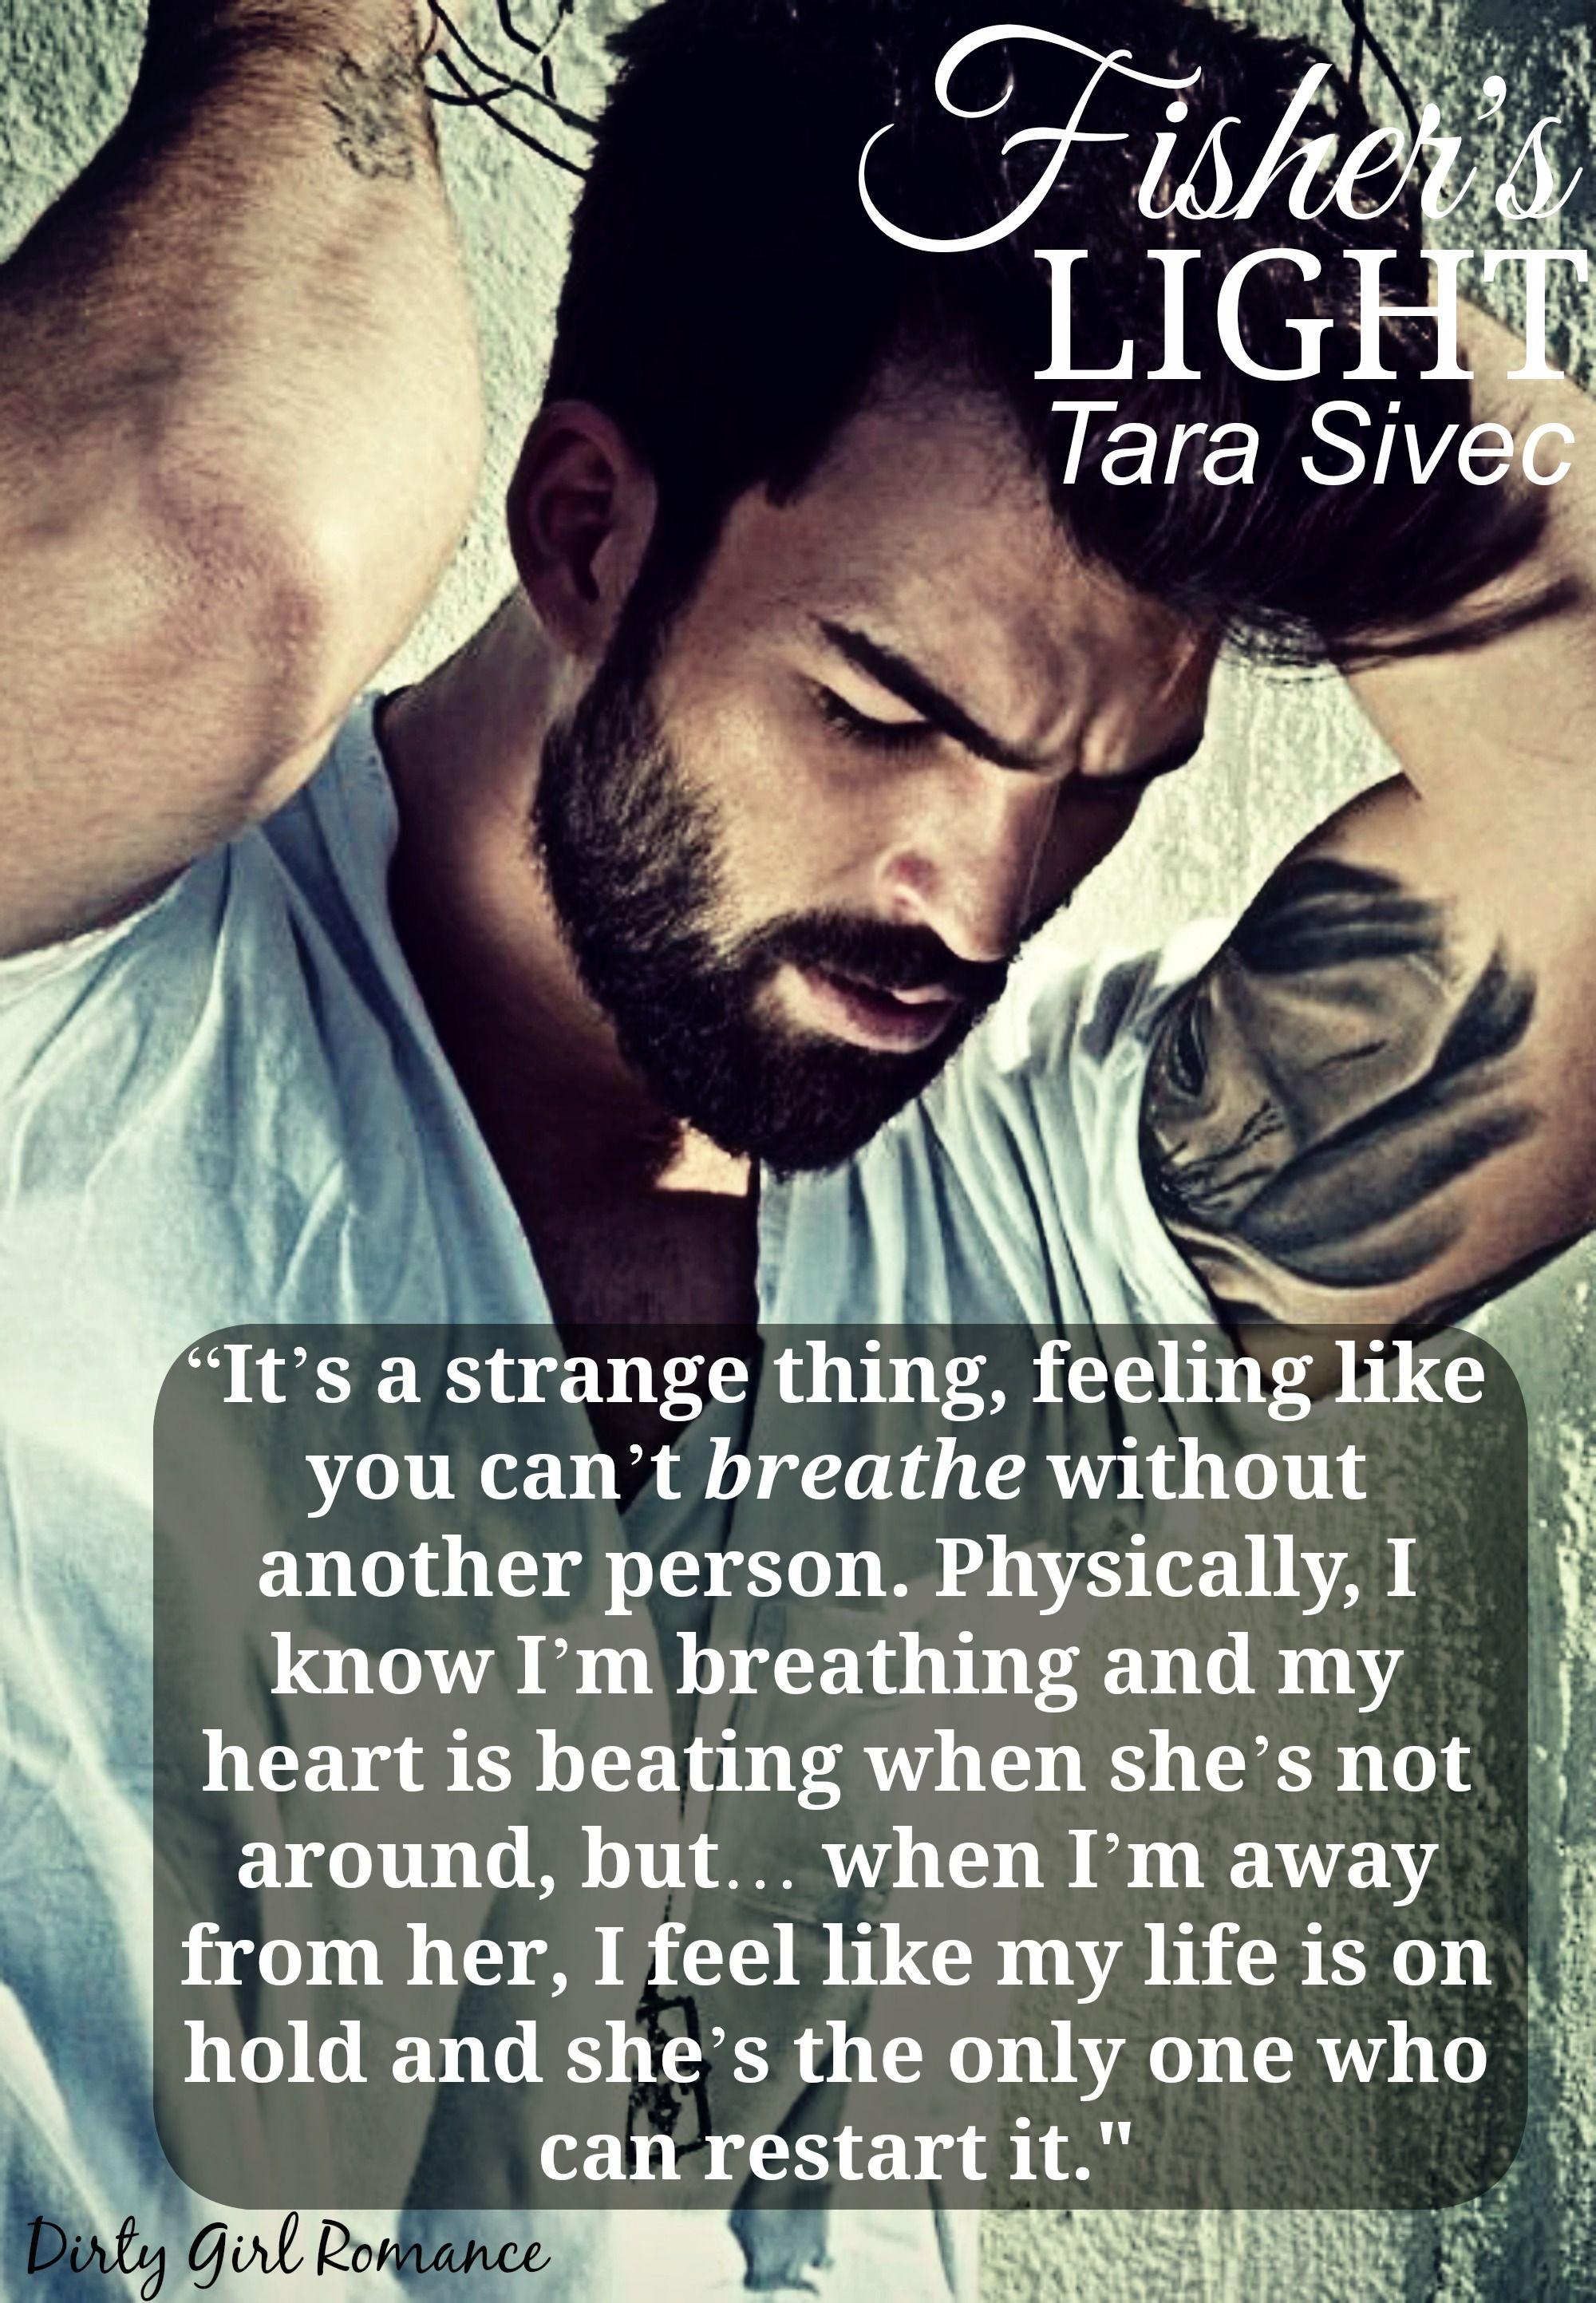 Fisher S Light By Tara Sivec Dirtygirlromance Favorite Book Quotes Book Boyfriends Book Teaser